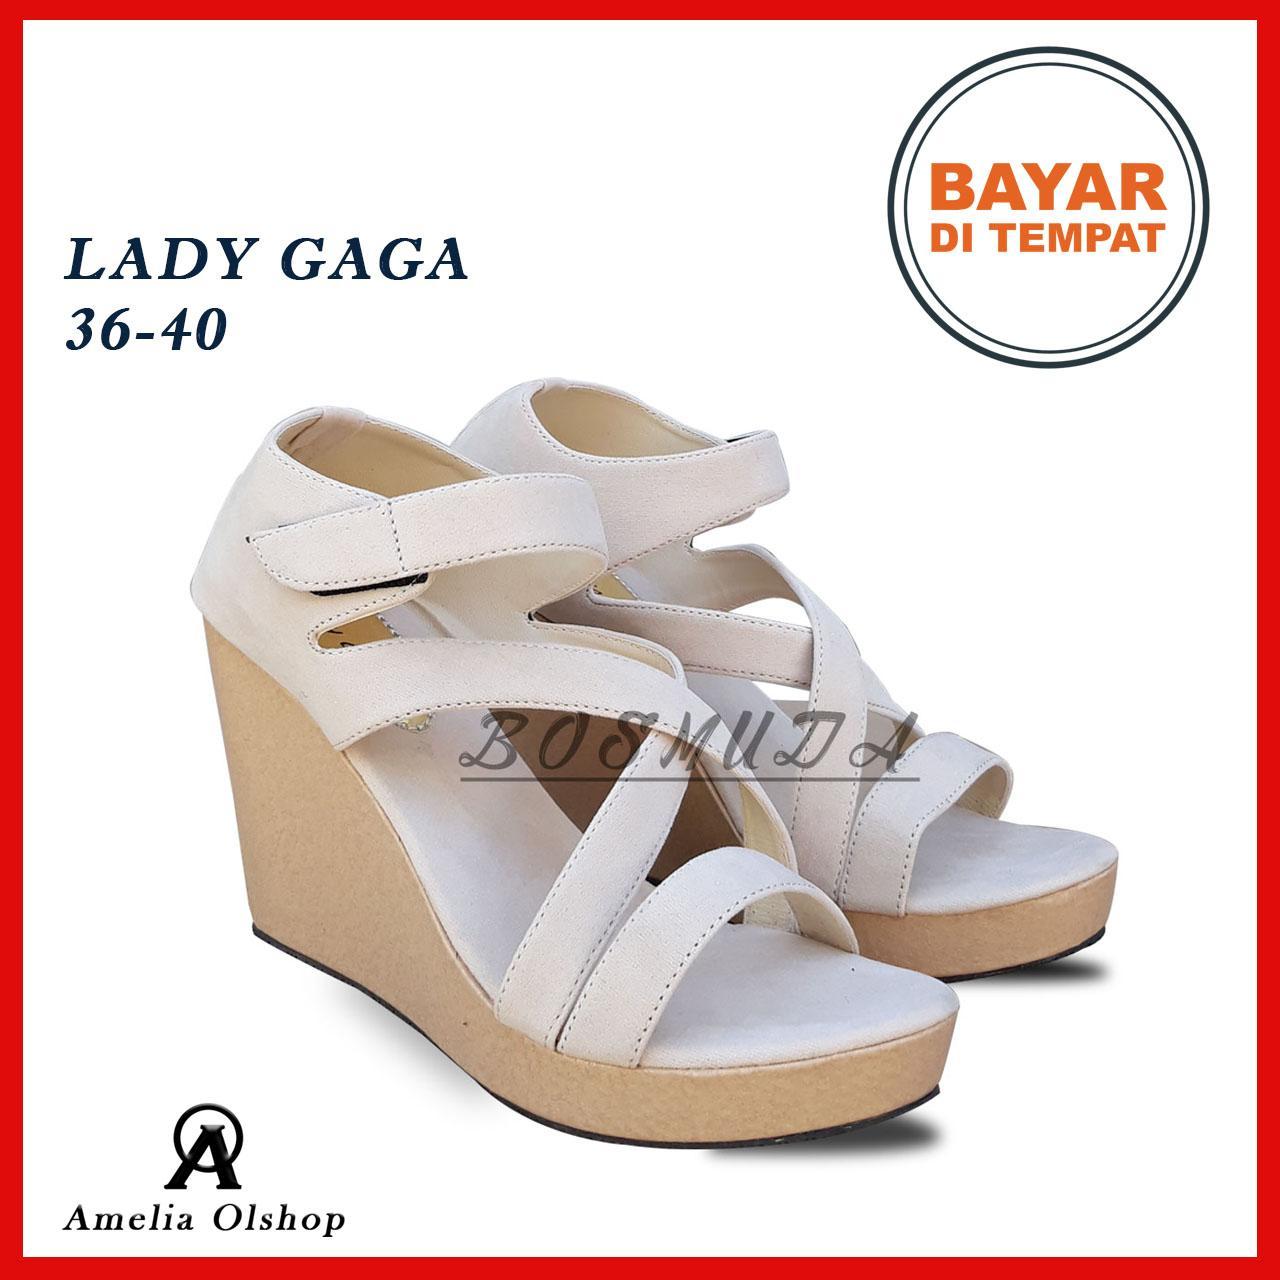 Amelia Olshop - Wedges Lady Gaga 36-40 / Wedges Wanita / Wedges Murah / Sandal Jinjit Wanita / Sandal Wedges Wanita